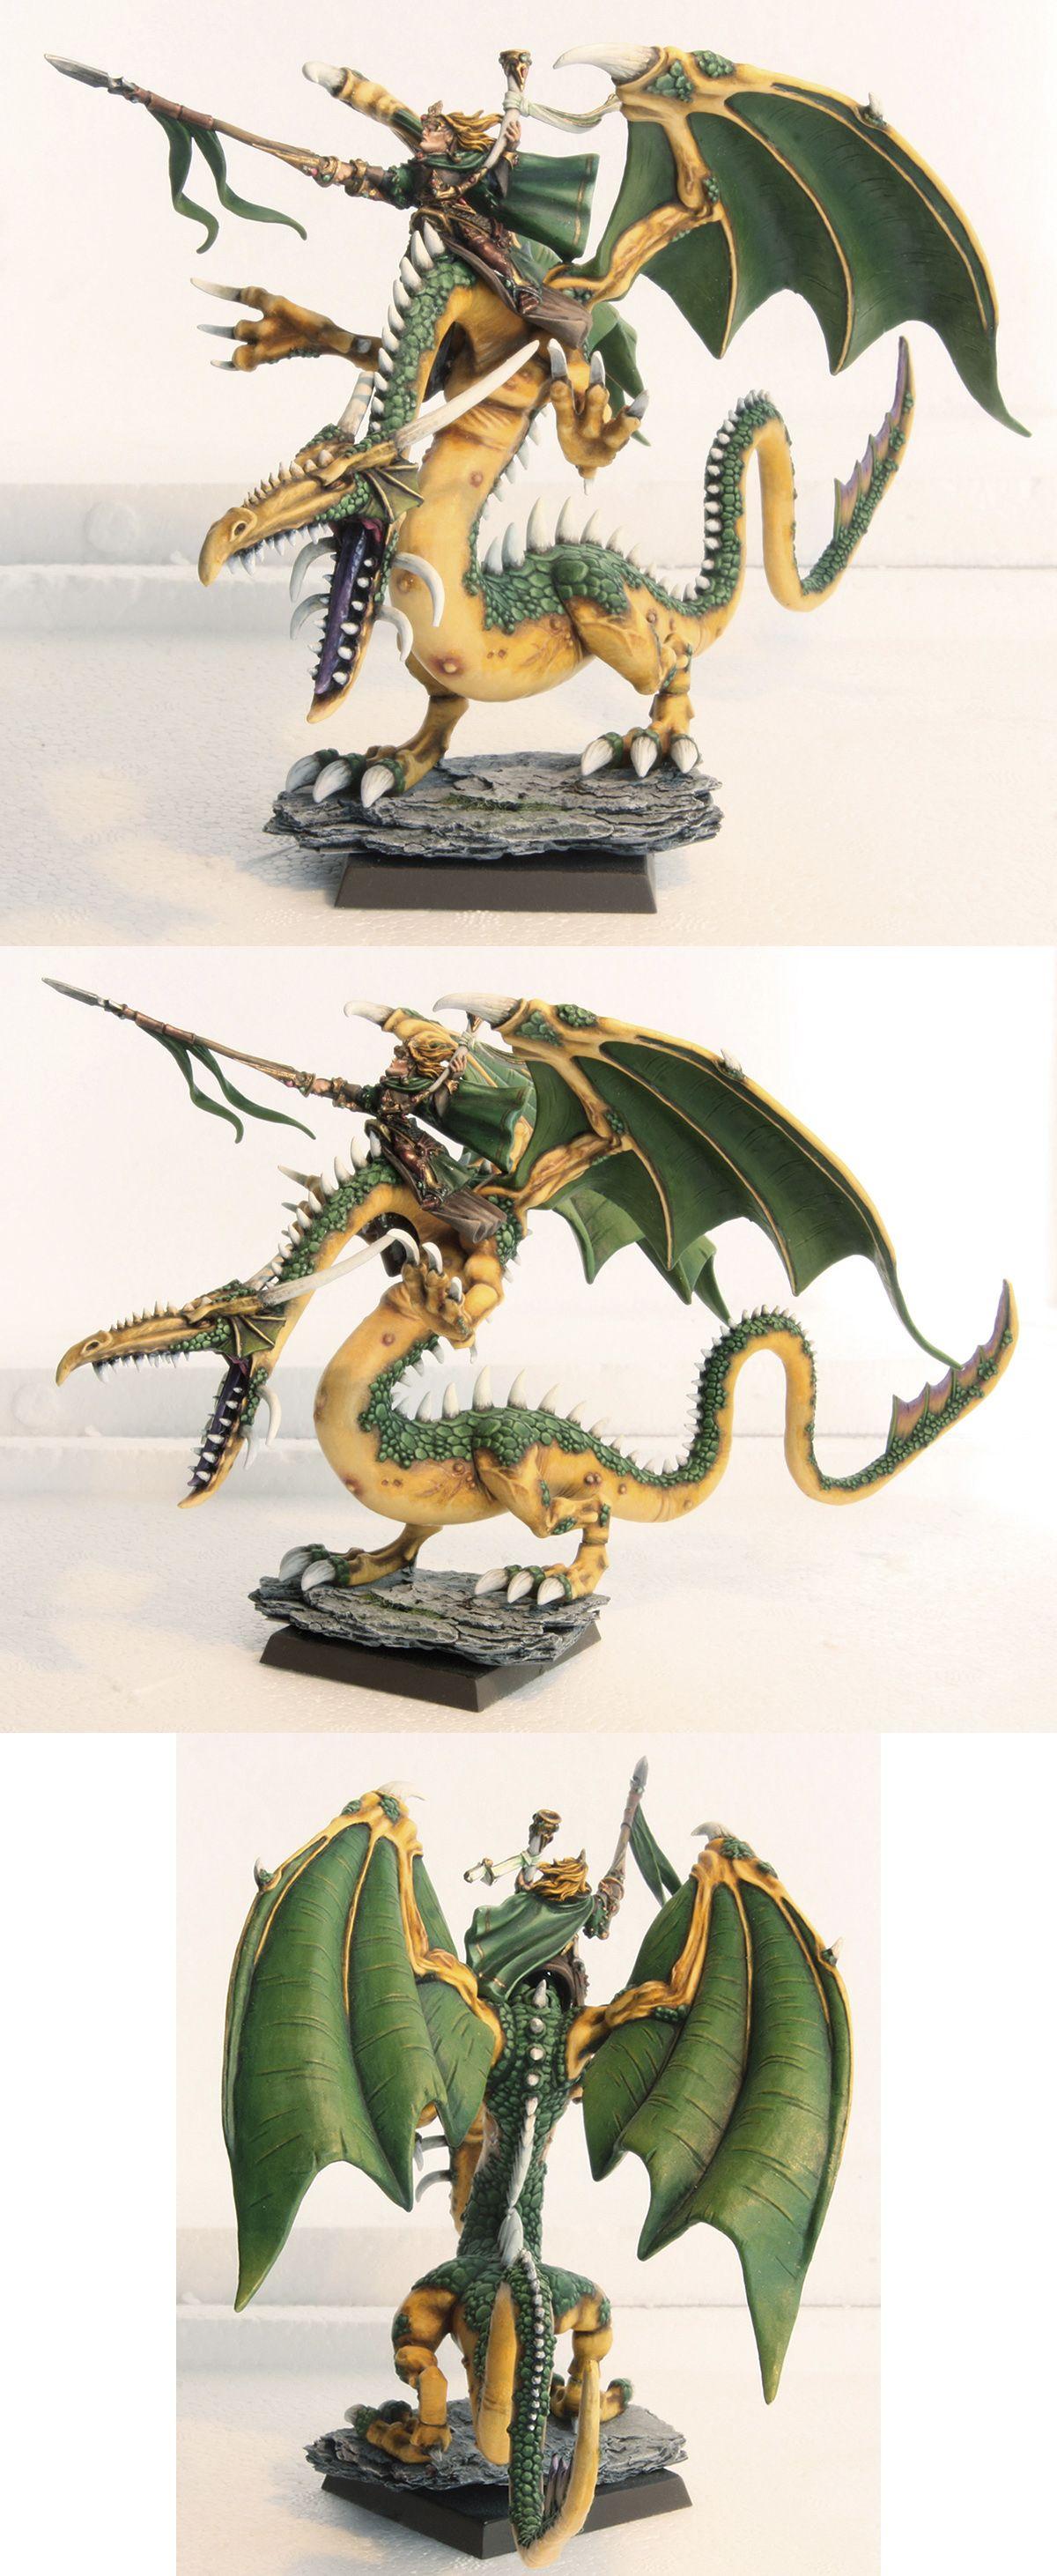 CoolMiniOrNot - Dragon Silvano | Warhammer wood elves